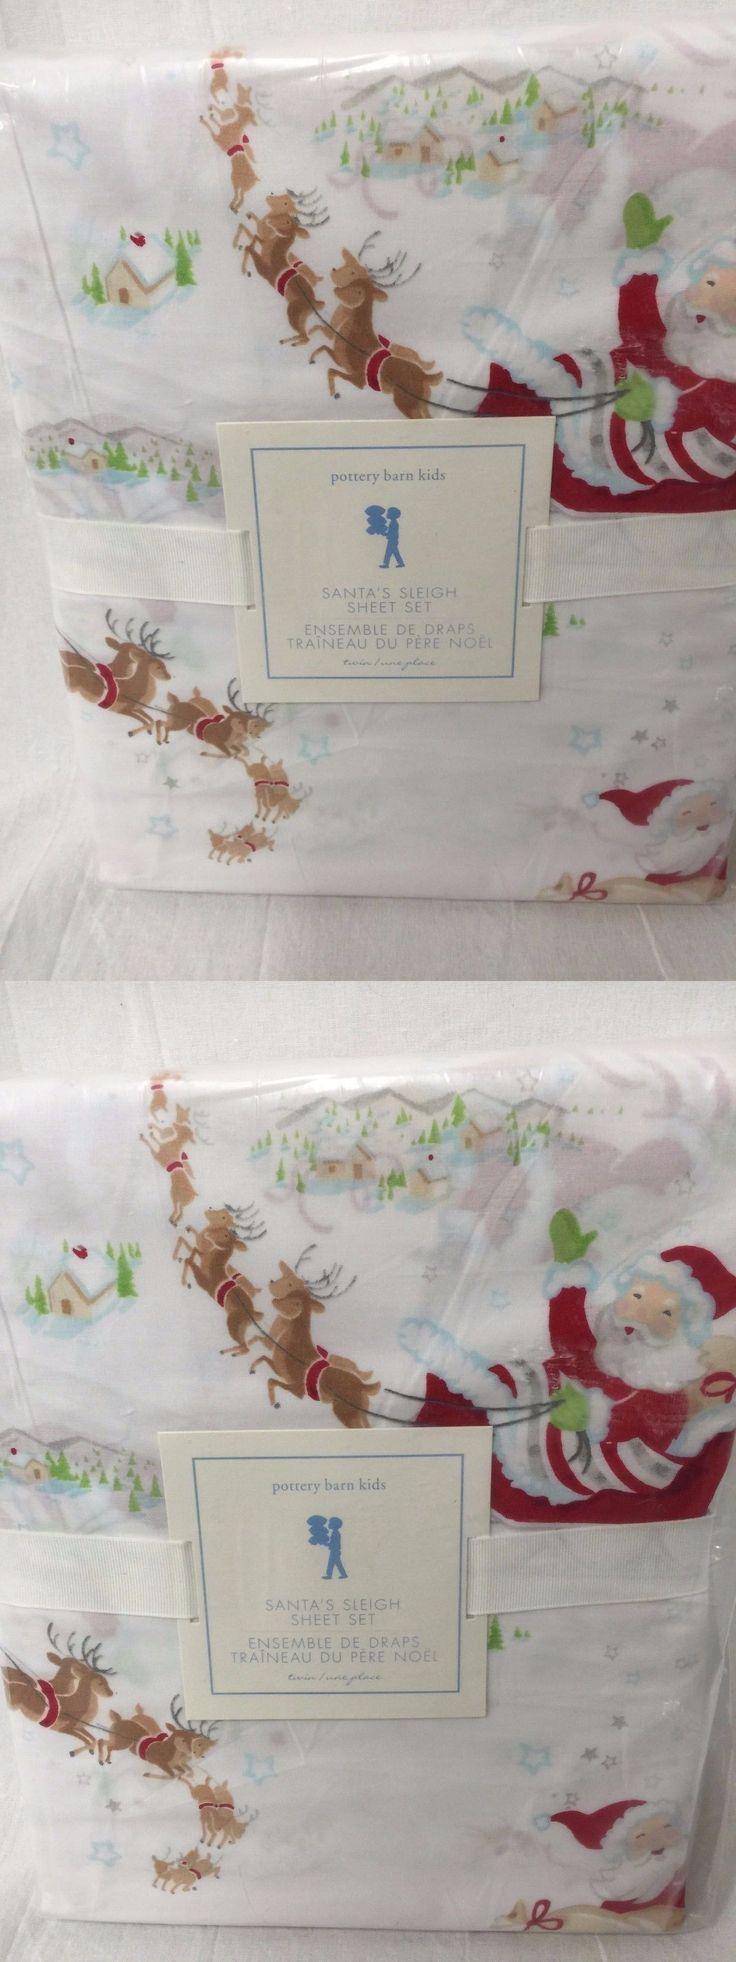 Kids Bedding: New Pottery Barn Kids Santas Sleigh Twin Sheet Set -> BUY IT NOW ONLY: $39.96 on eBay!